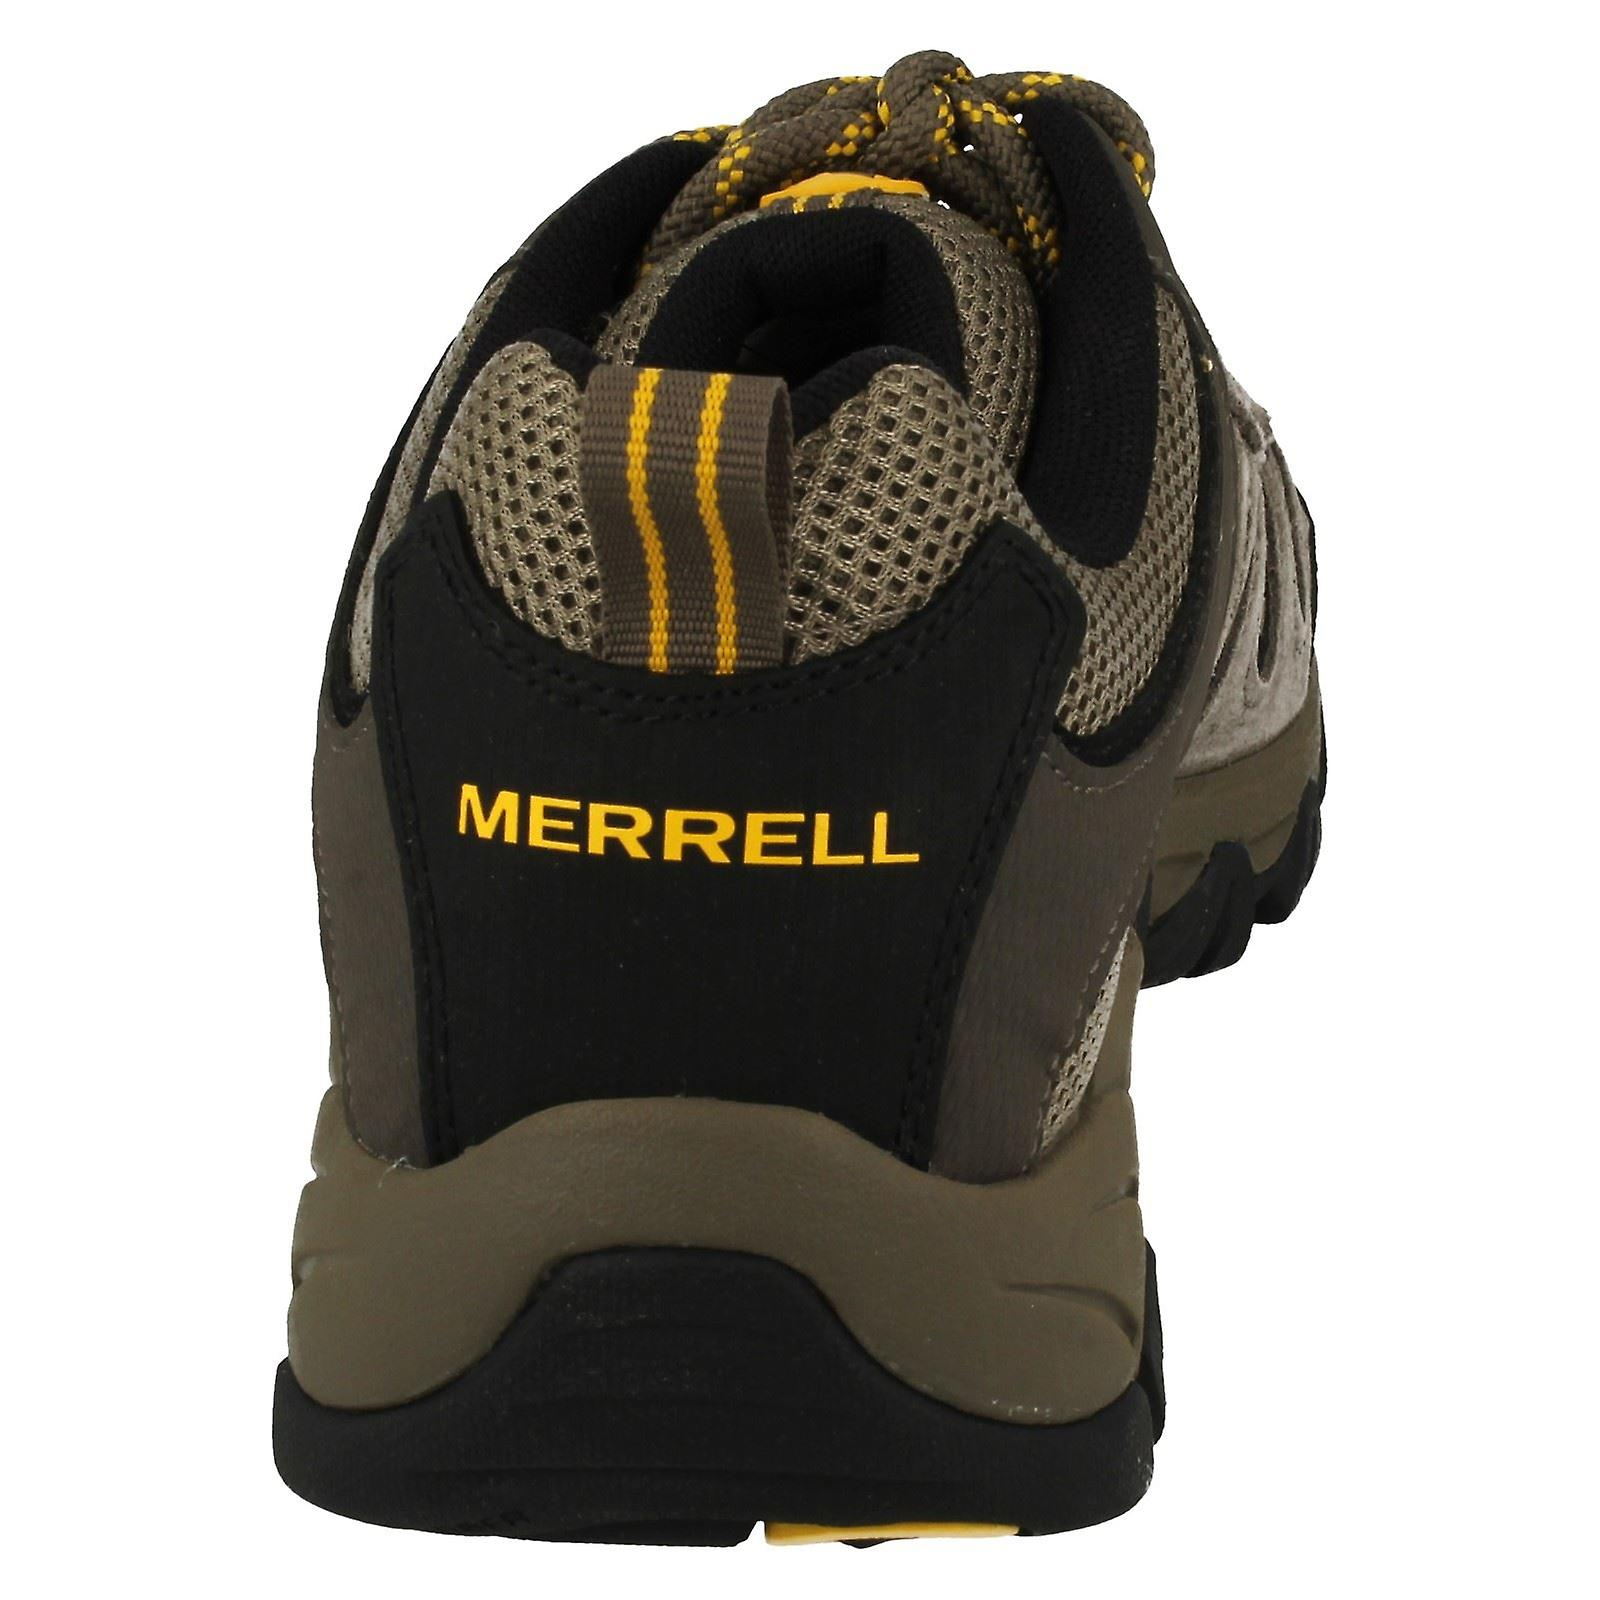 Mens Merrell Casual Lace Up formateurs Ridgepass boulon